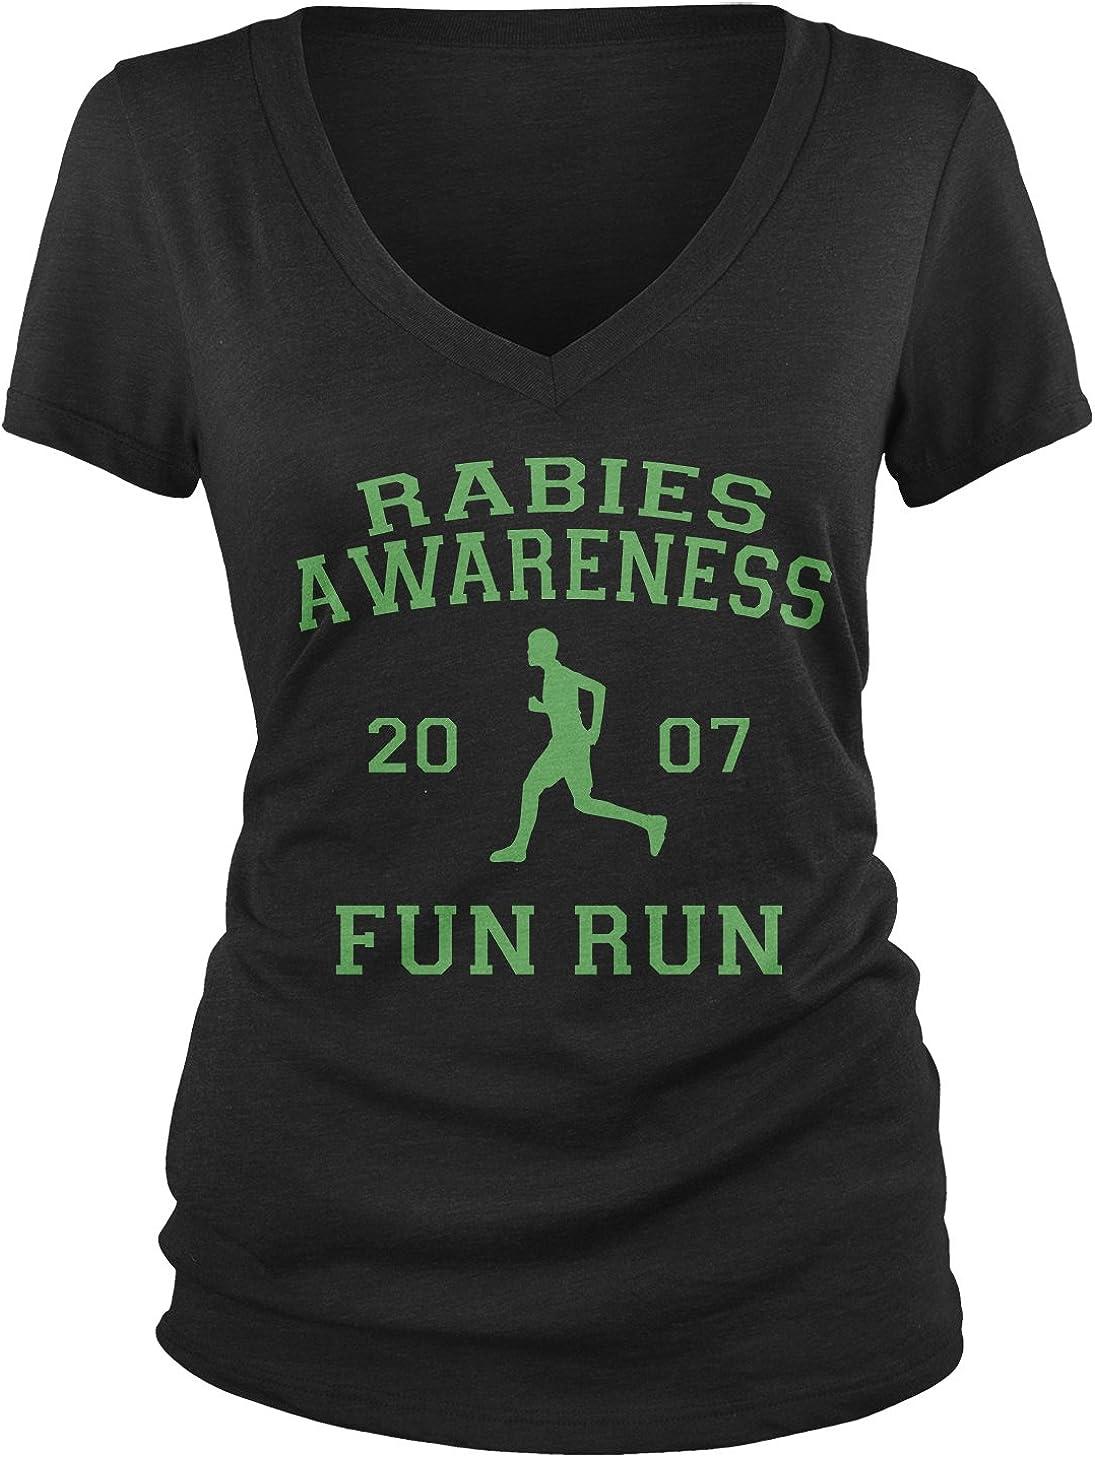 Amdesco Junior's The Office Rabies Awareness Fun Run 2007 V-Neck T-Shirt